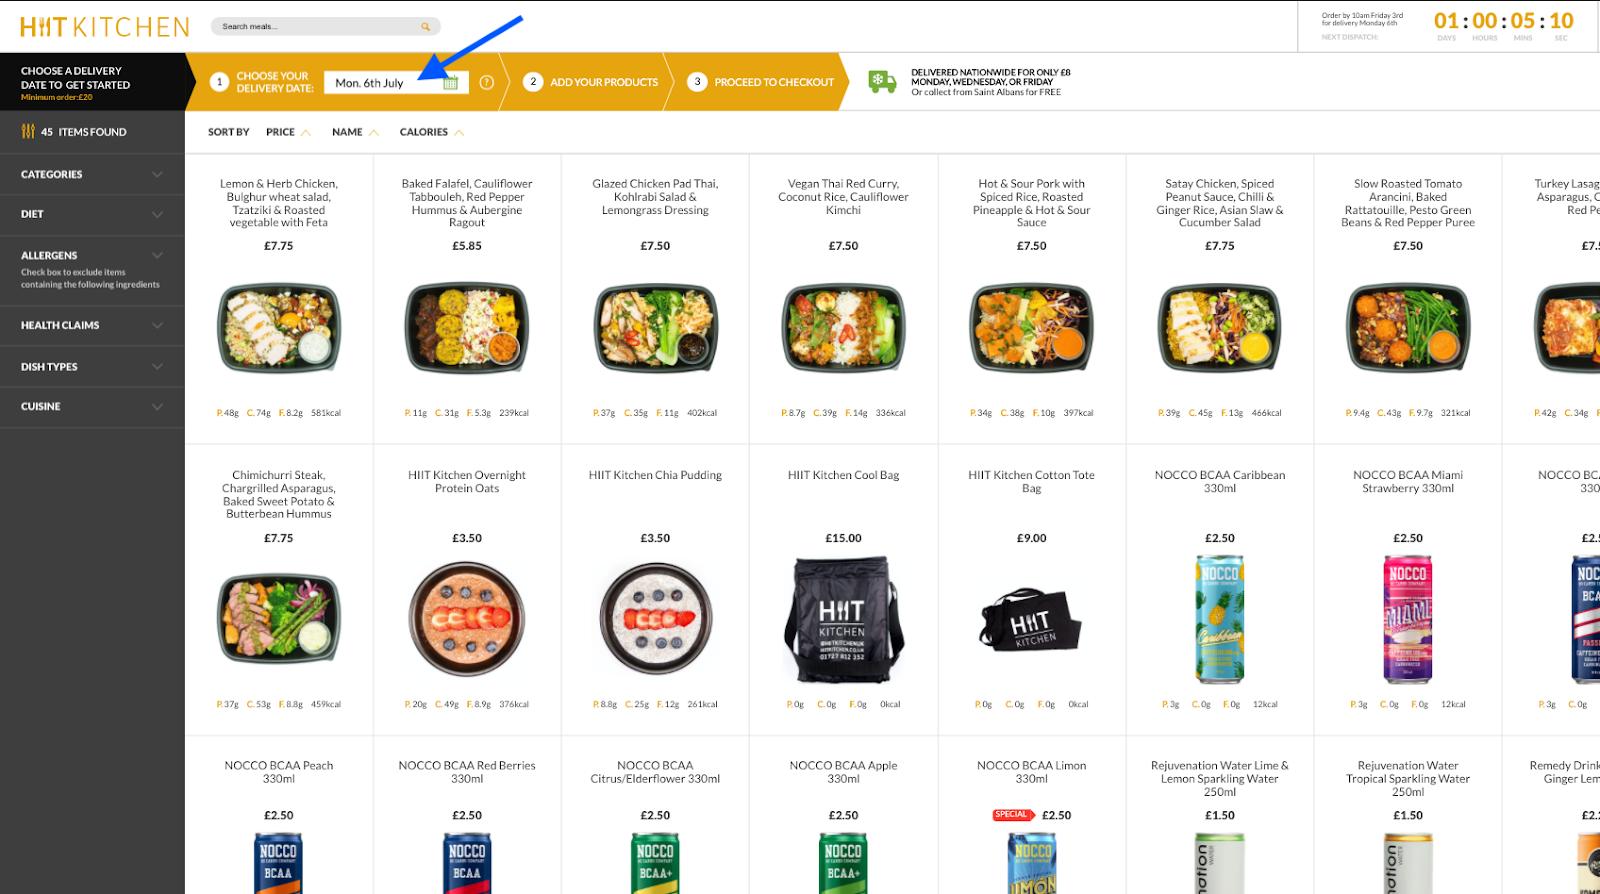 HIIT Kitchen Website Changes - Product Menu